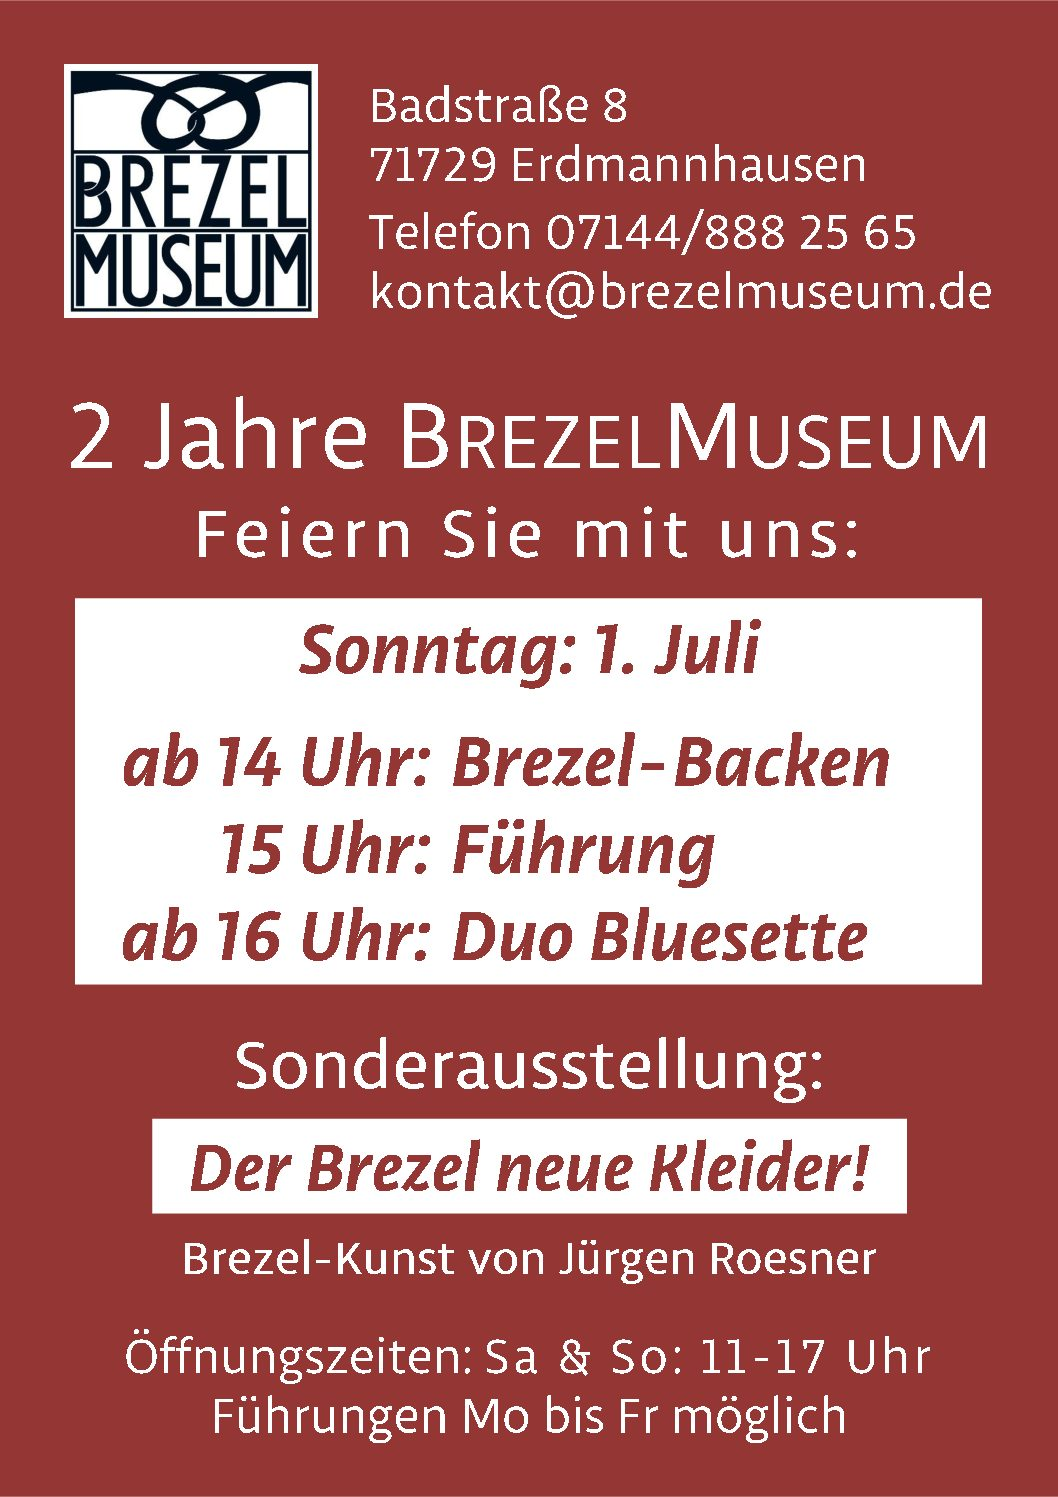 BrezelMuseum feiert 2. Geburtstag